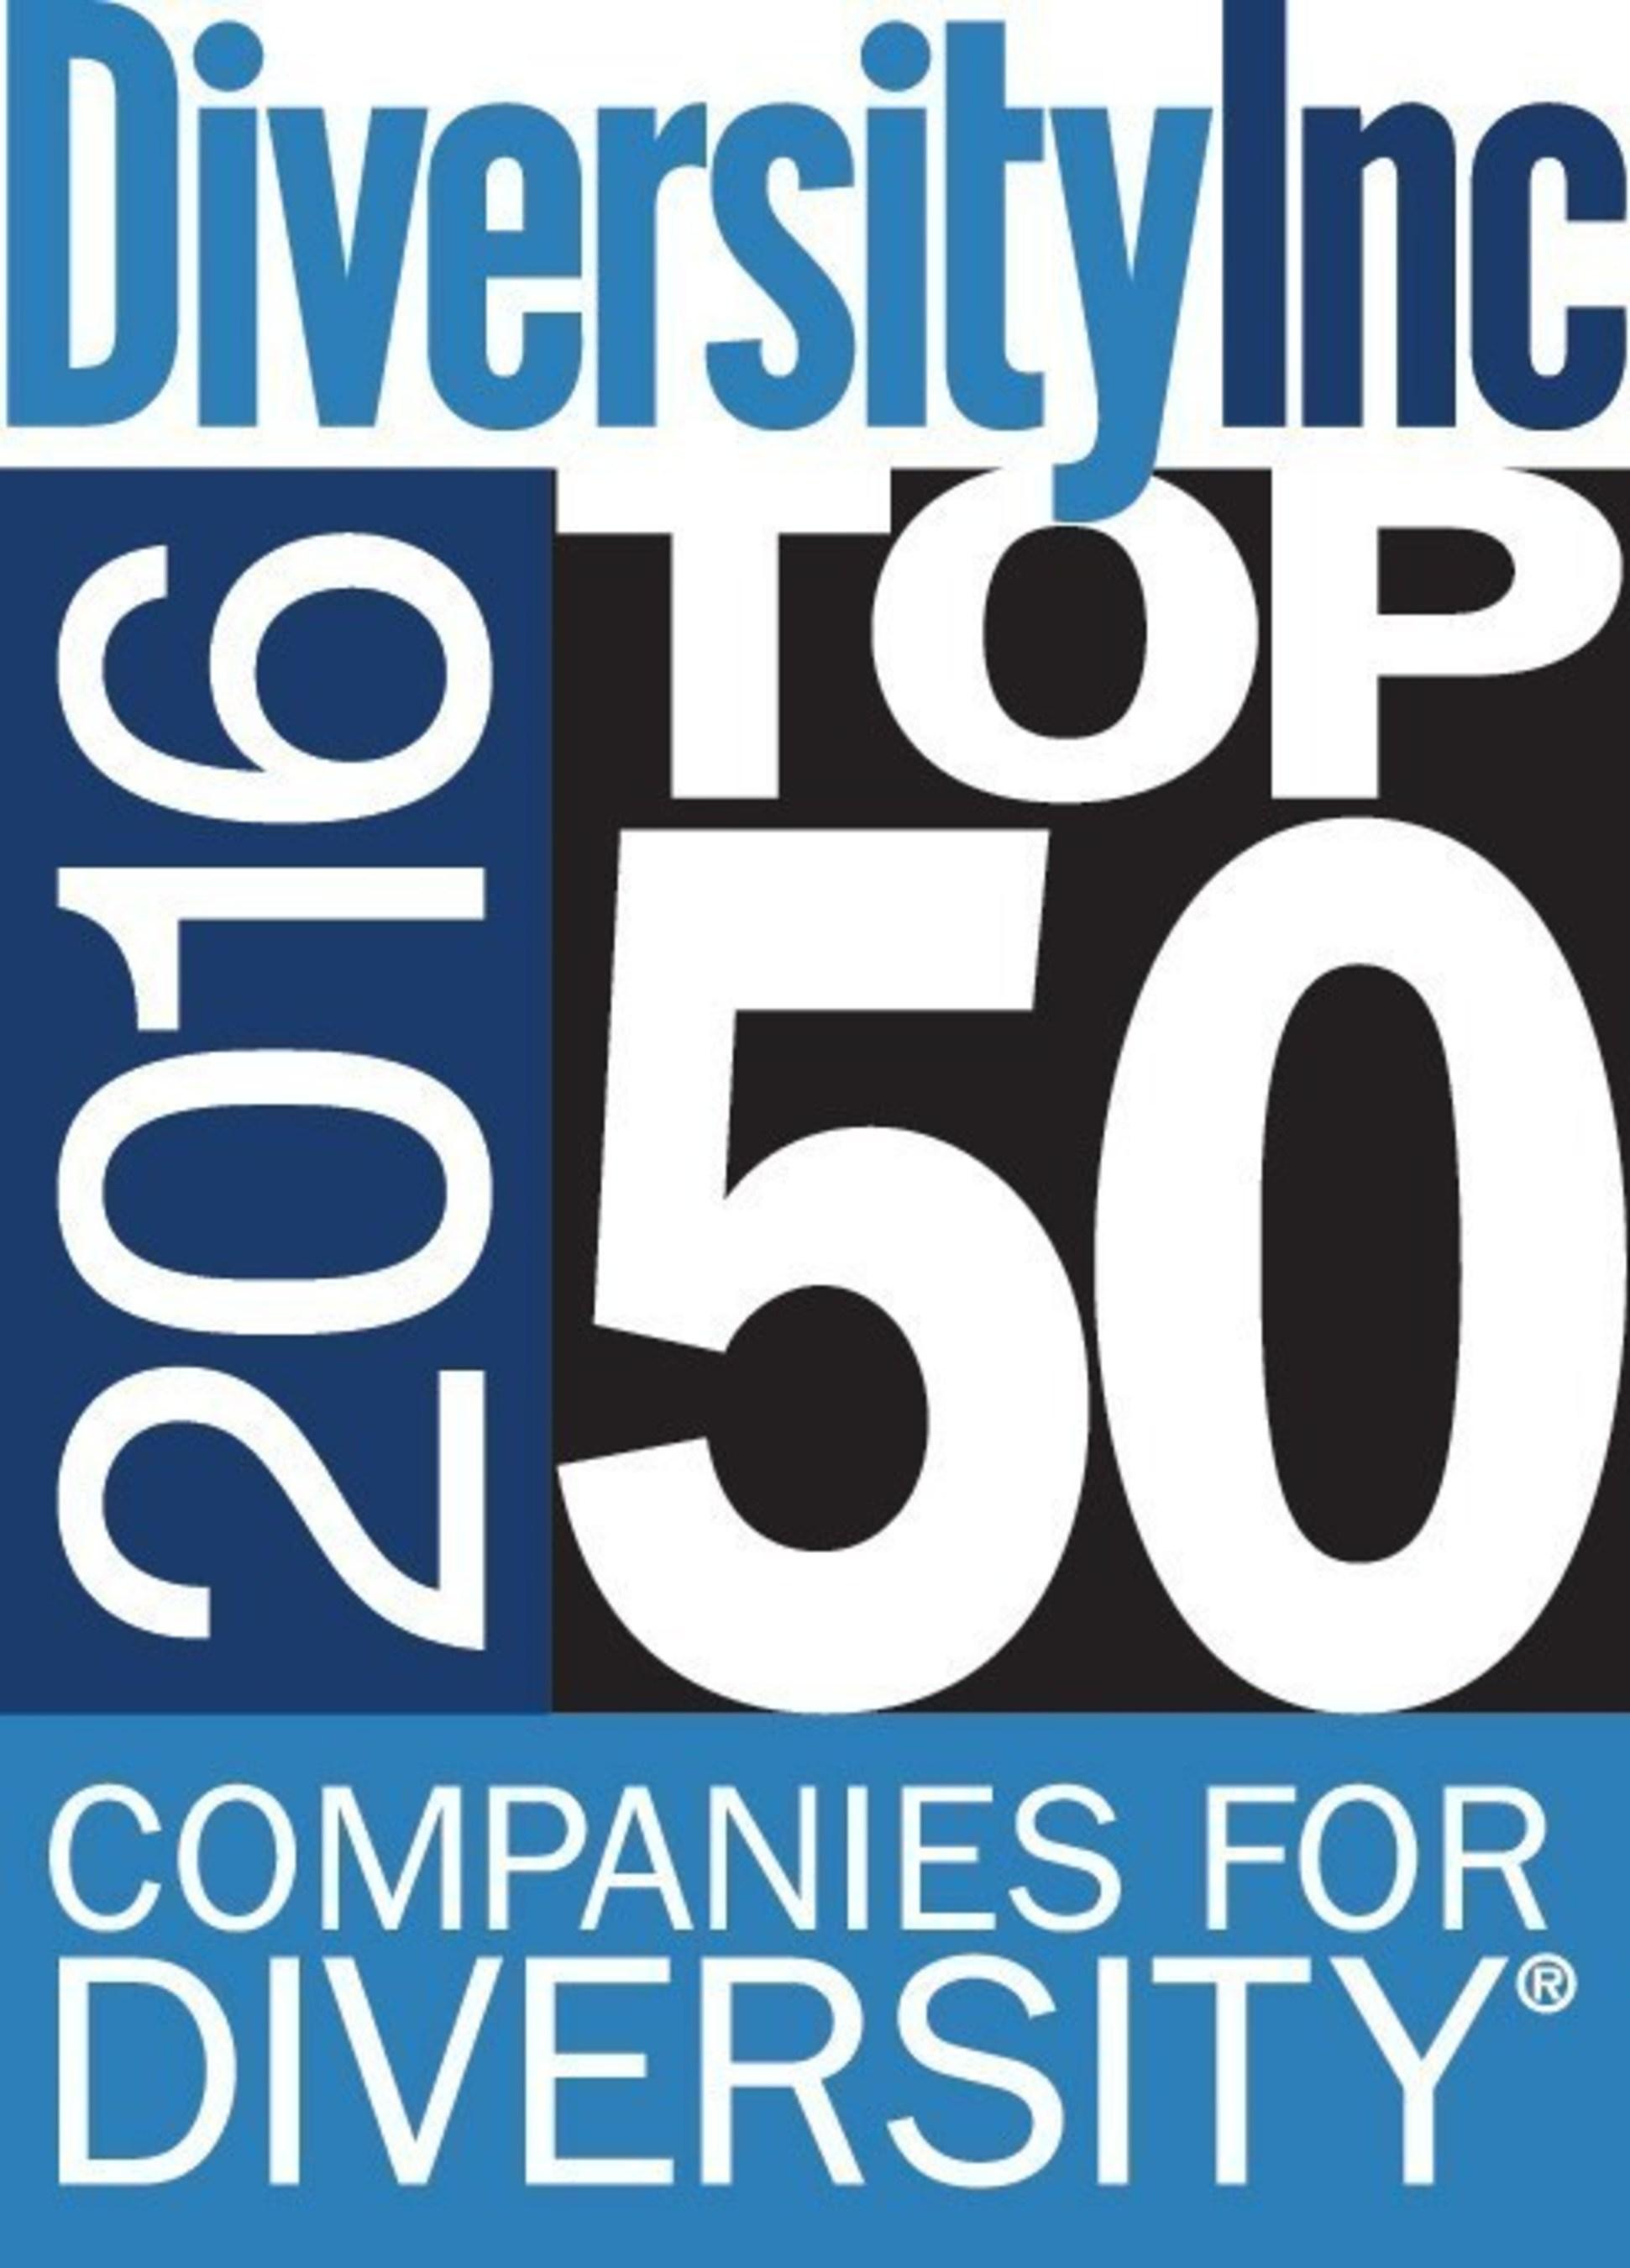 Diversity Inc. Top 50 2016